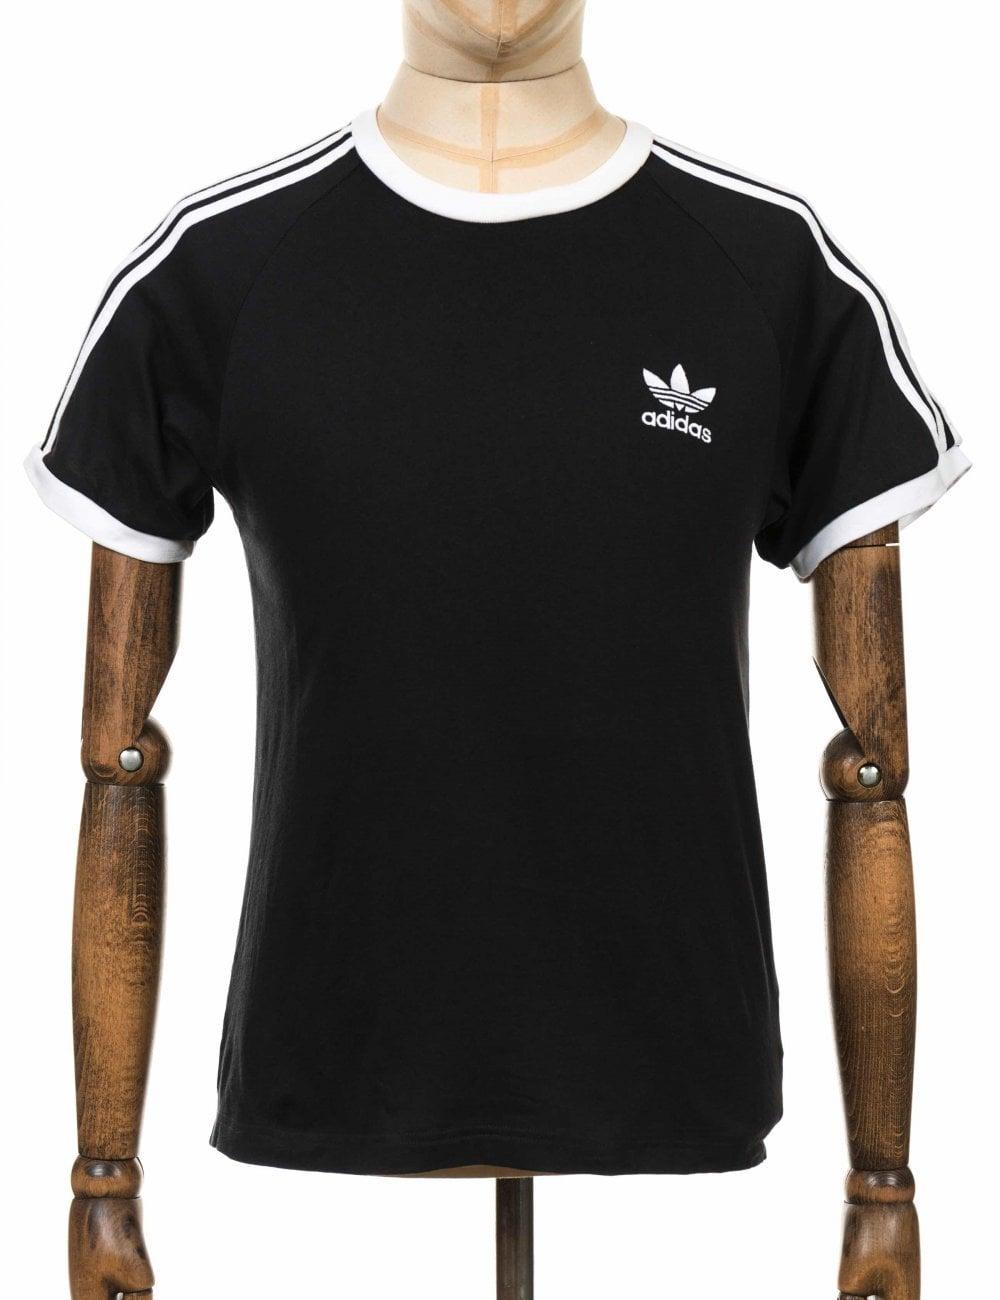 932dd4c05a5 Adidas Originals 3 Stripe Trefoil Tee - Black/White - Clothing from ...